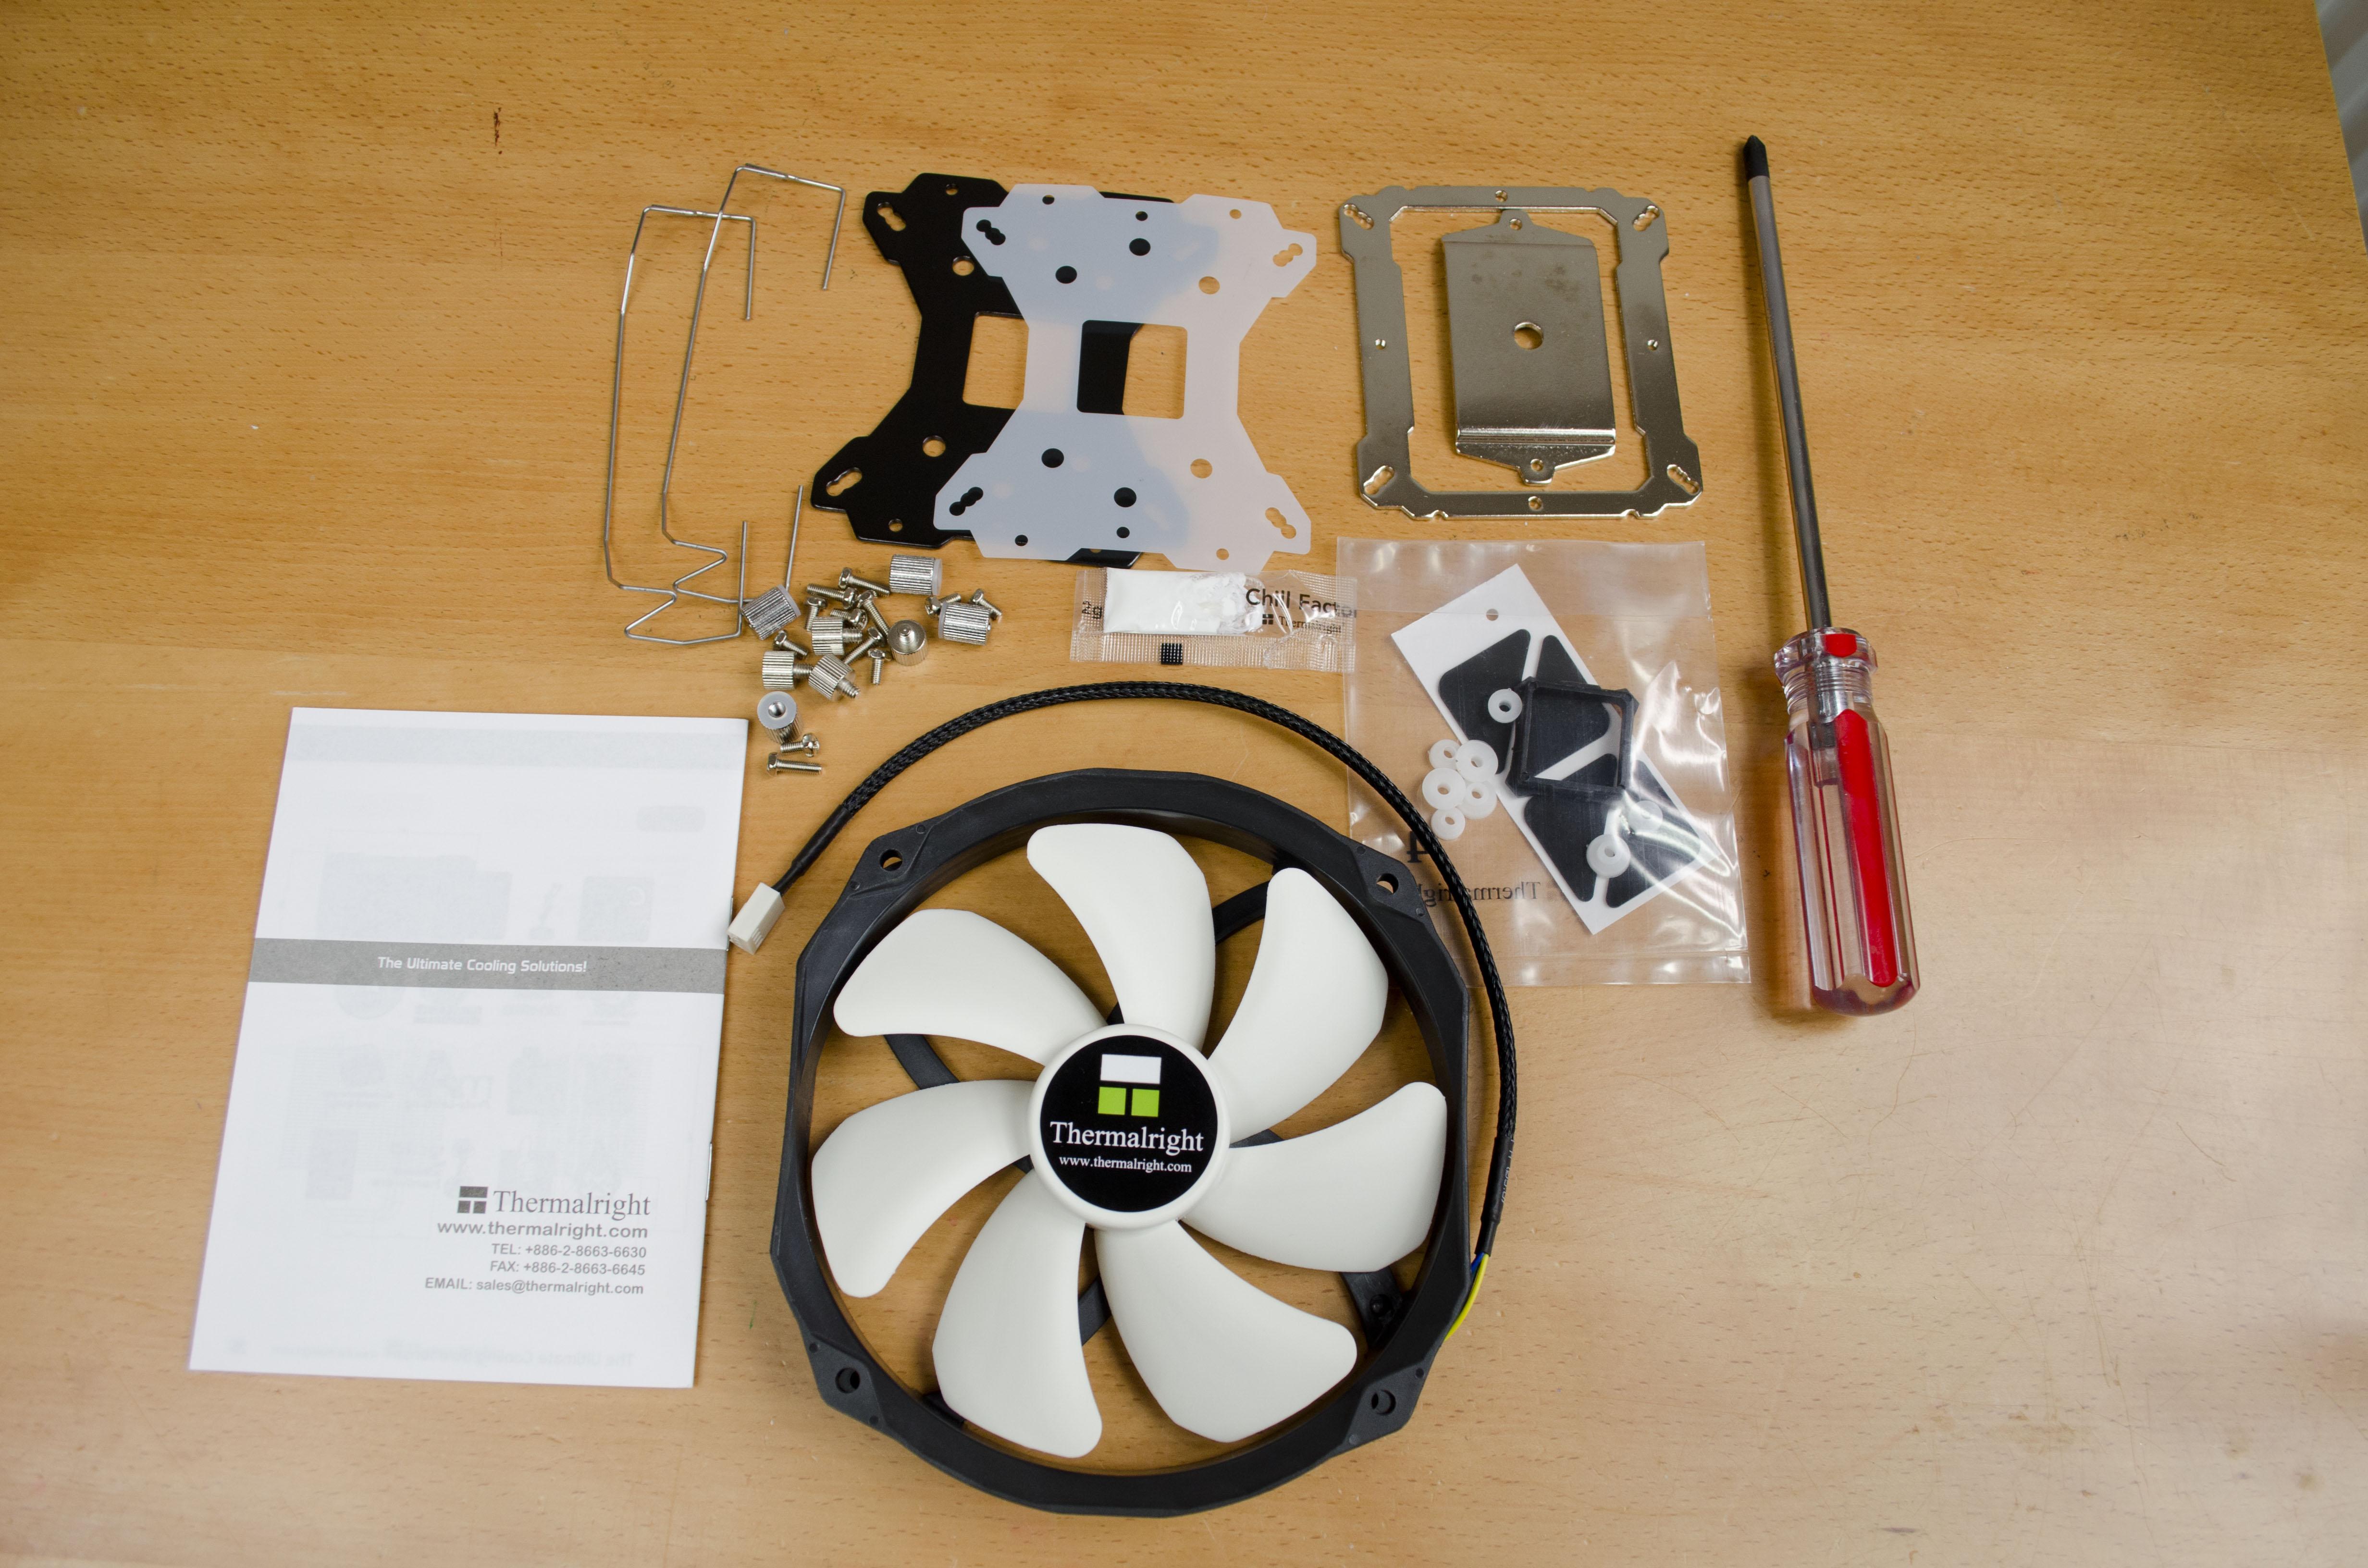 Raspberry Pi 3 Fan Installation Instructions